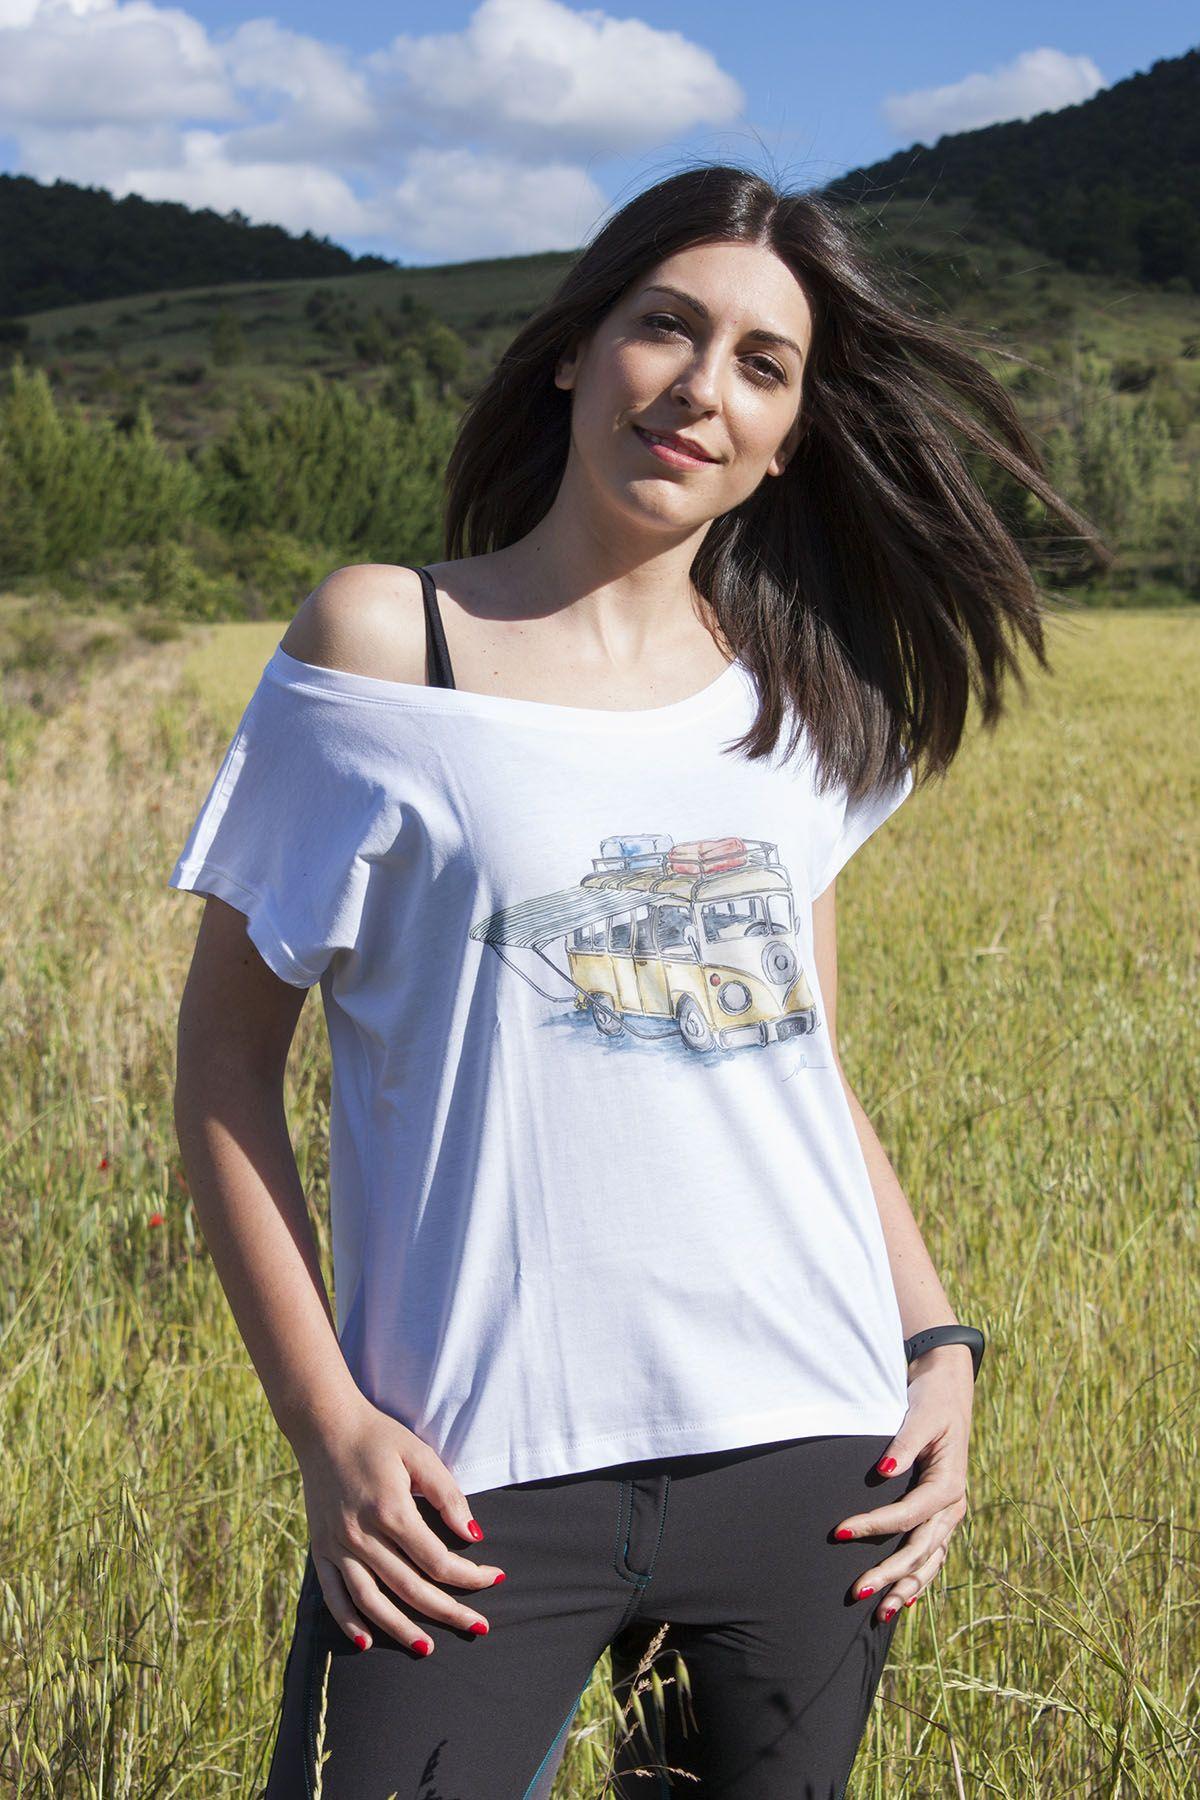 camiseta-furgoneta camper vw-algodon organico-sirem wild-moda sostenible